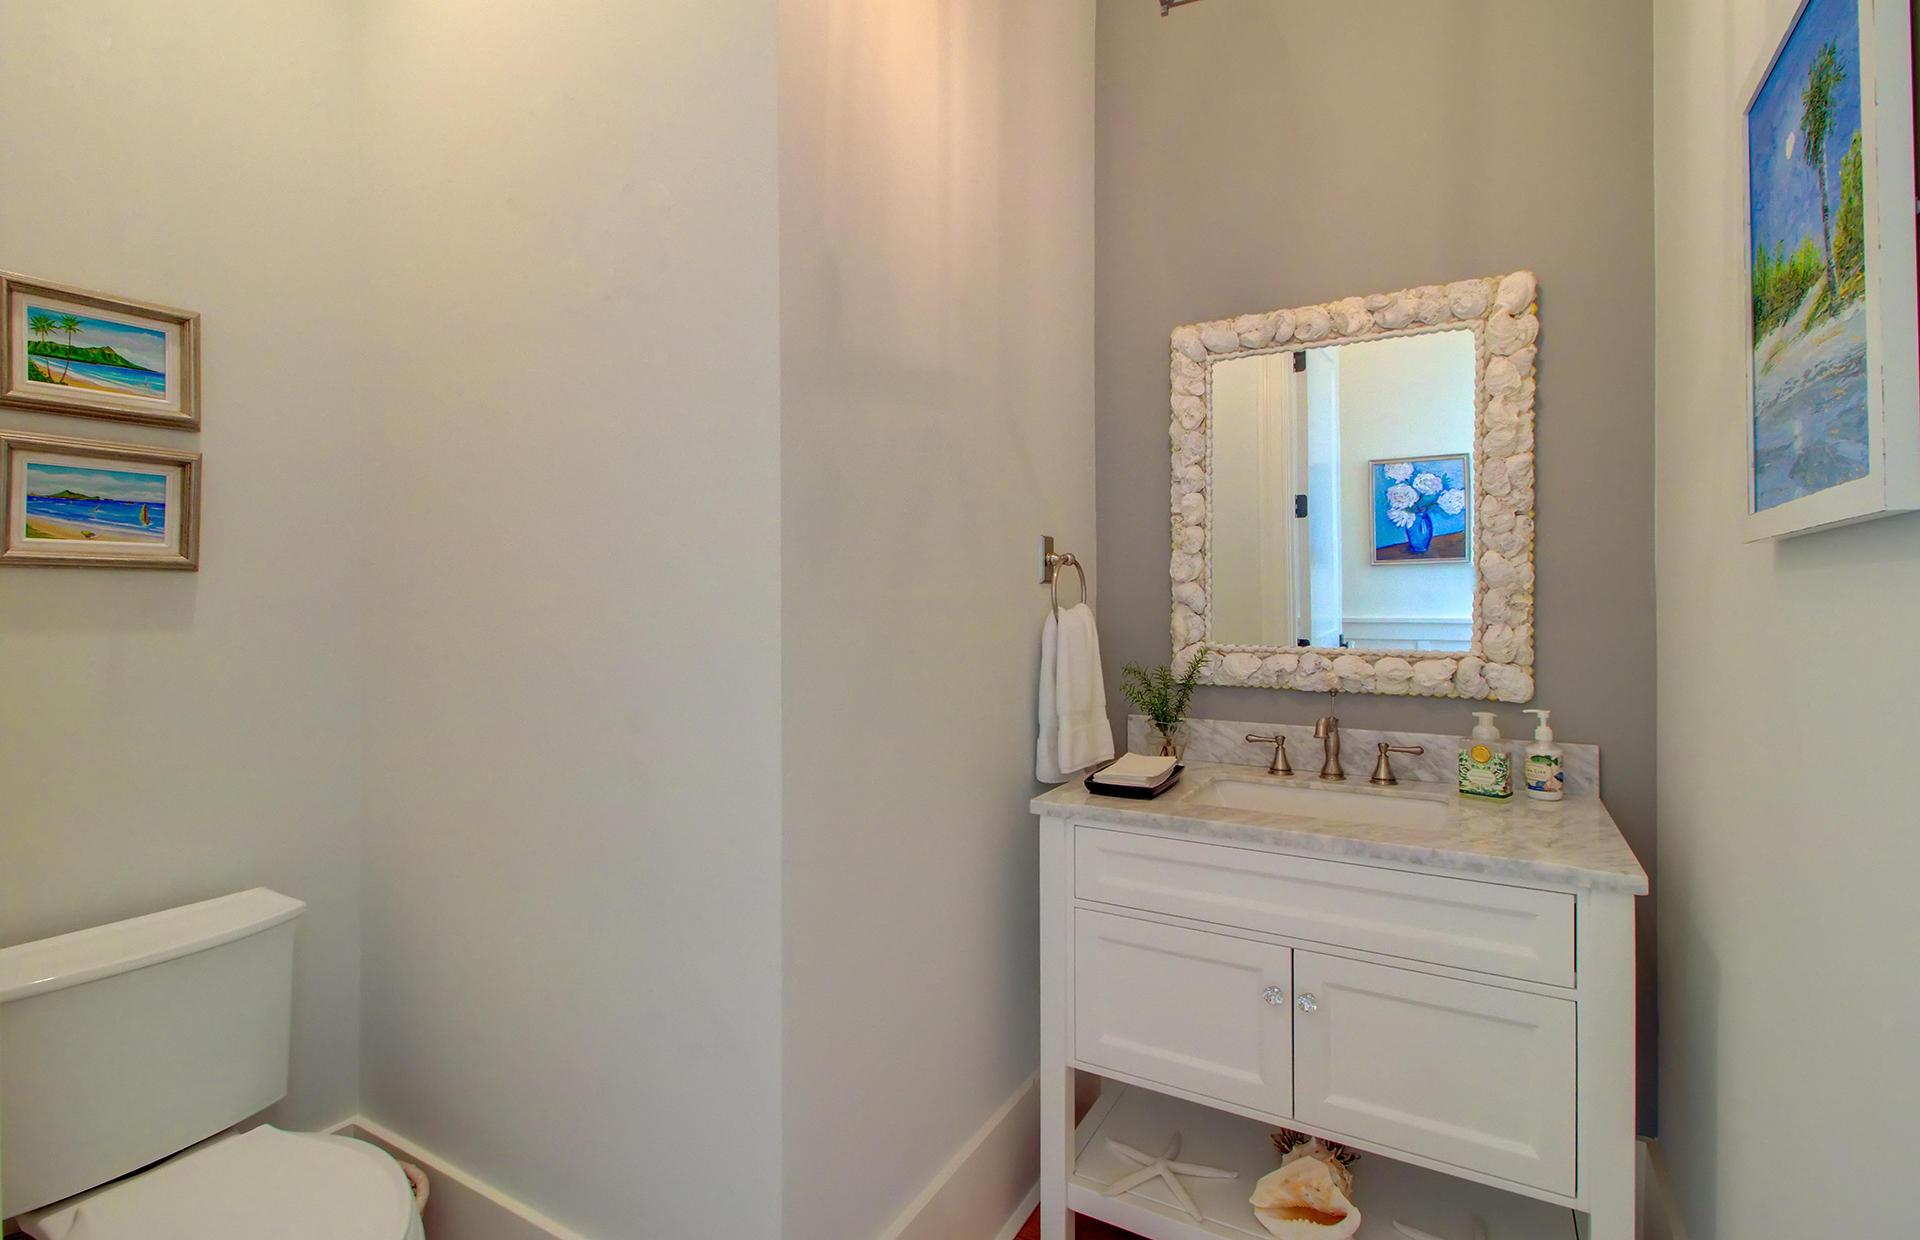 Beresford Hall Homes For Sale - 253 Grand Park, Charleston, SC - 29